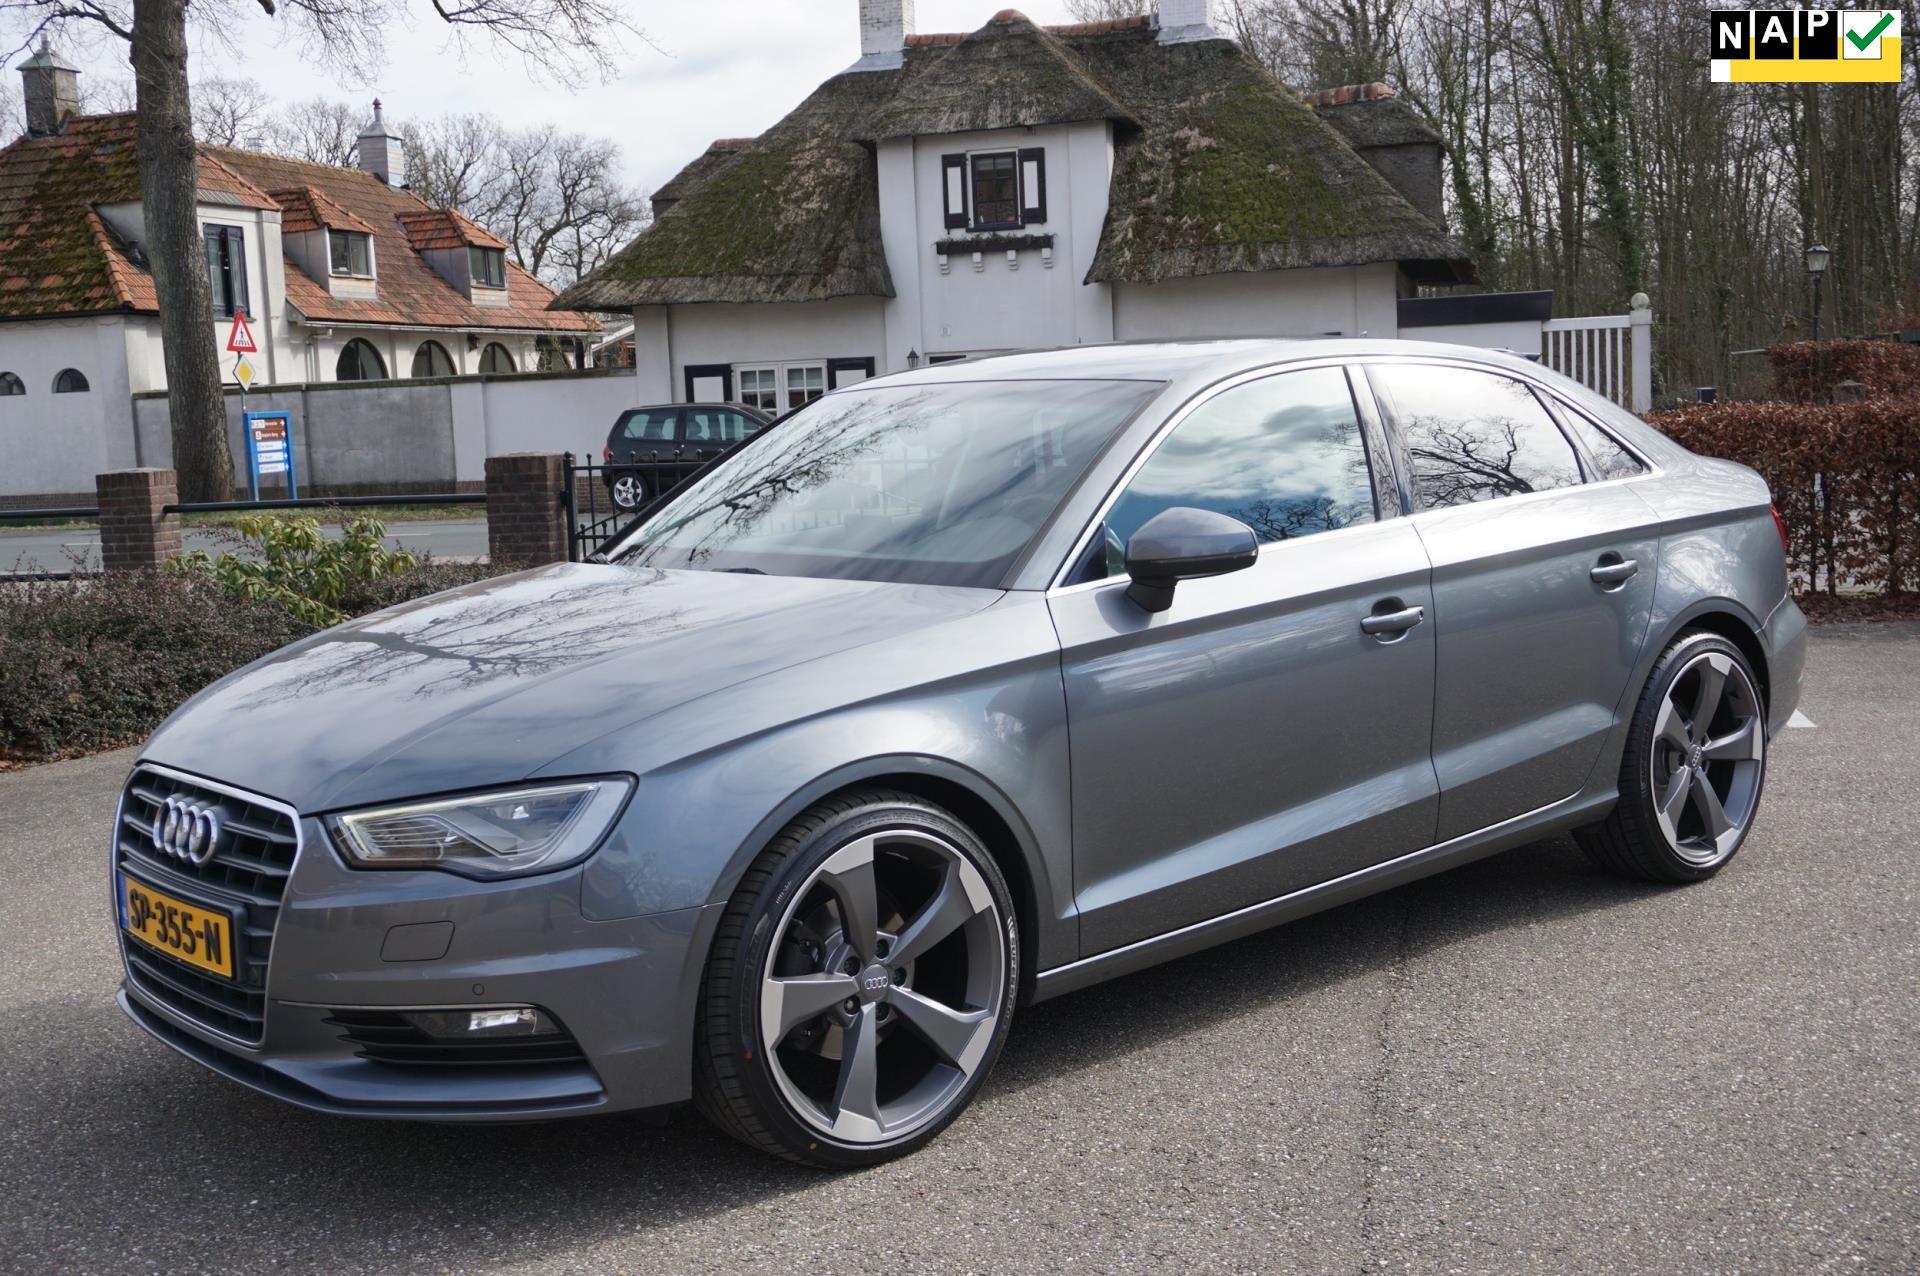 Audi A3 Limousine occasion - Autobedrijf Hooghordel